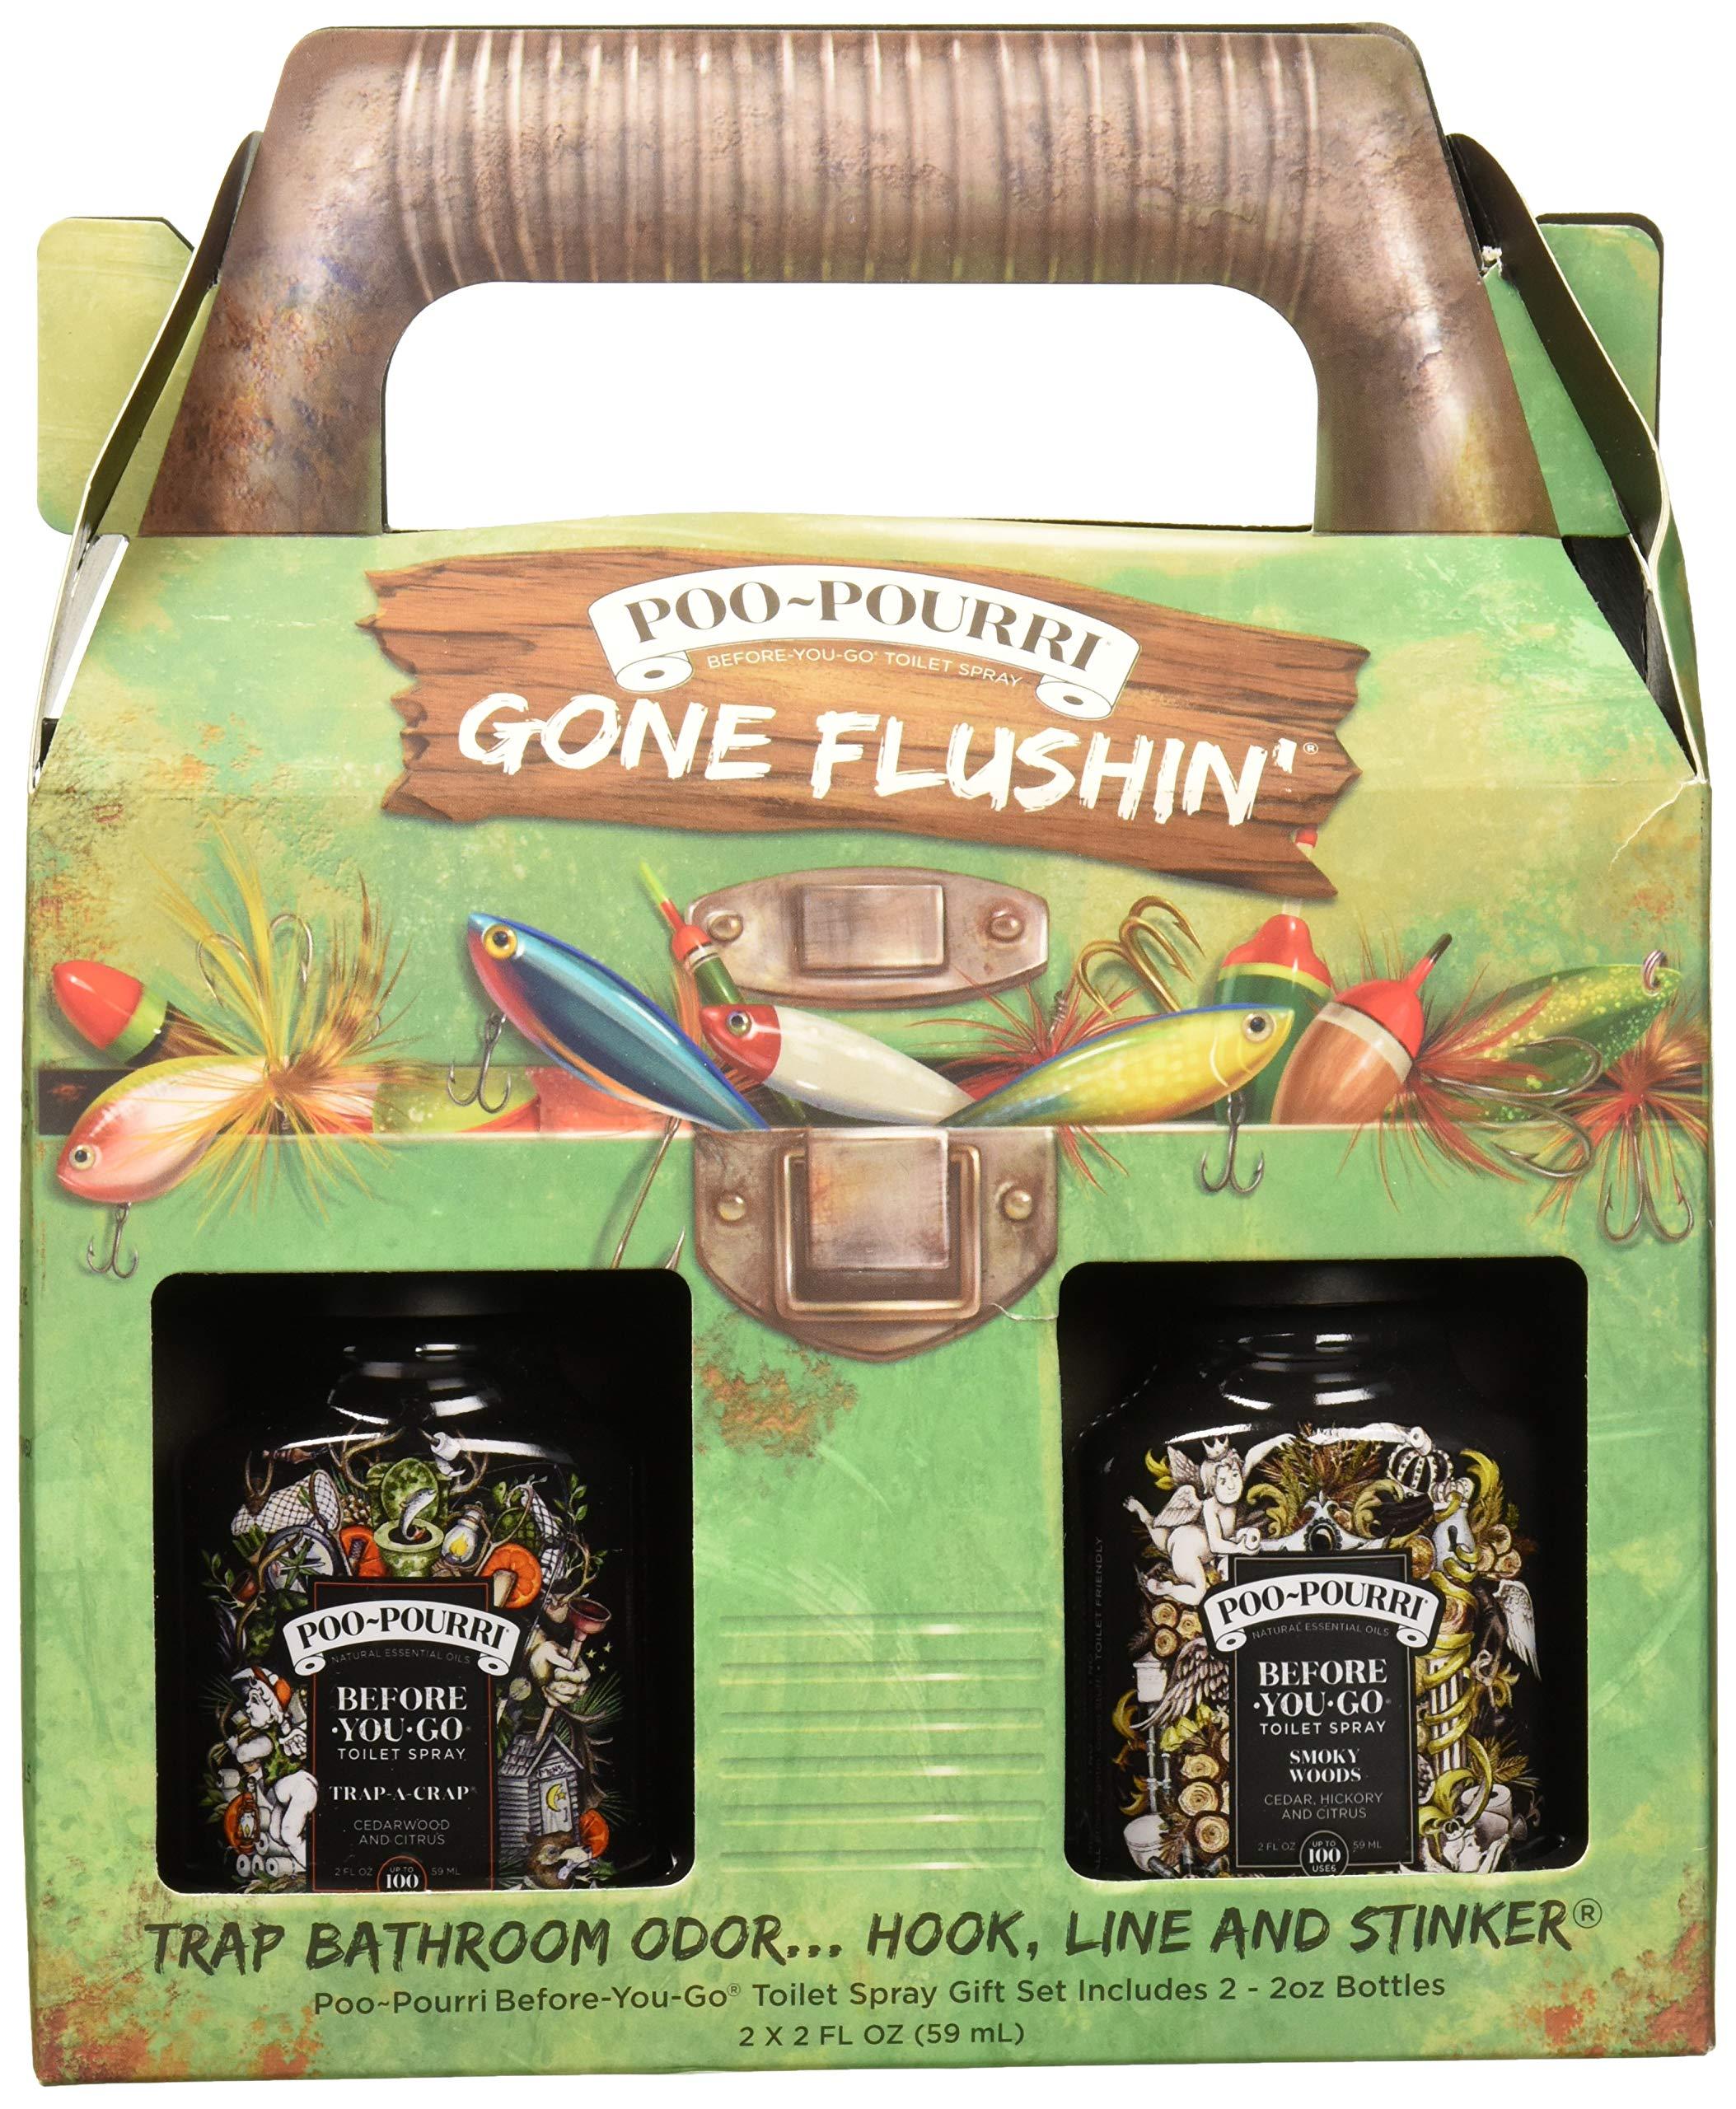 Poo-Pourri Gone Flushin Before You Go Toilet Spray Gift Set in Tackle Box